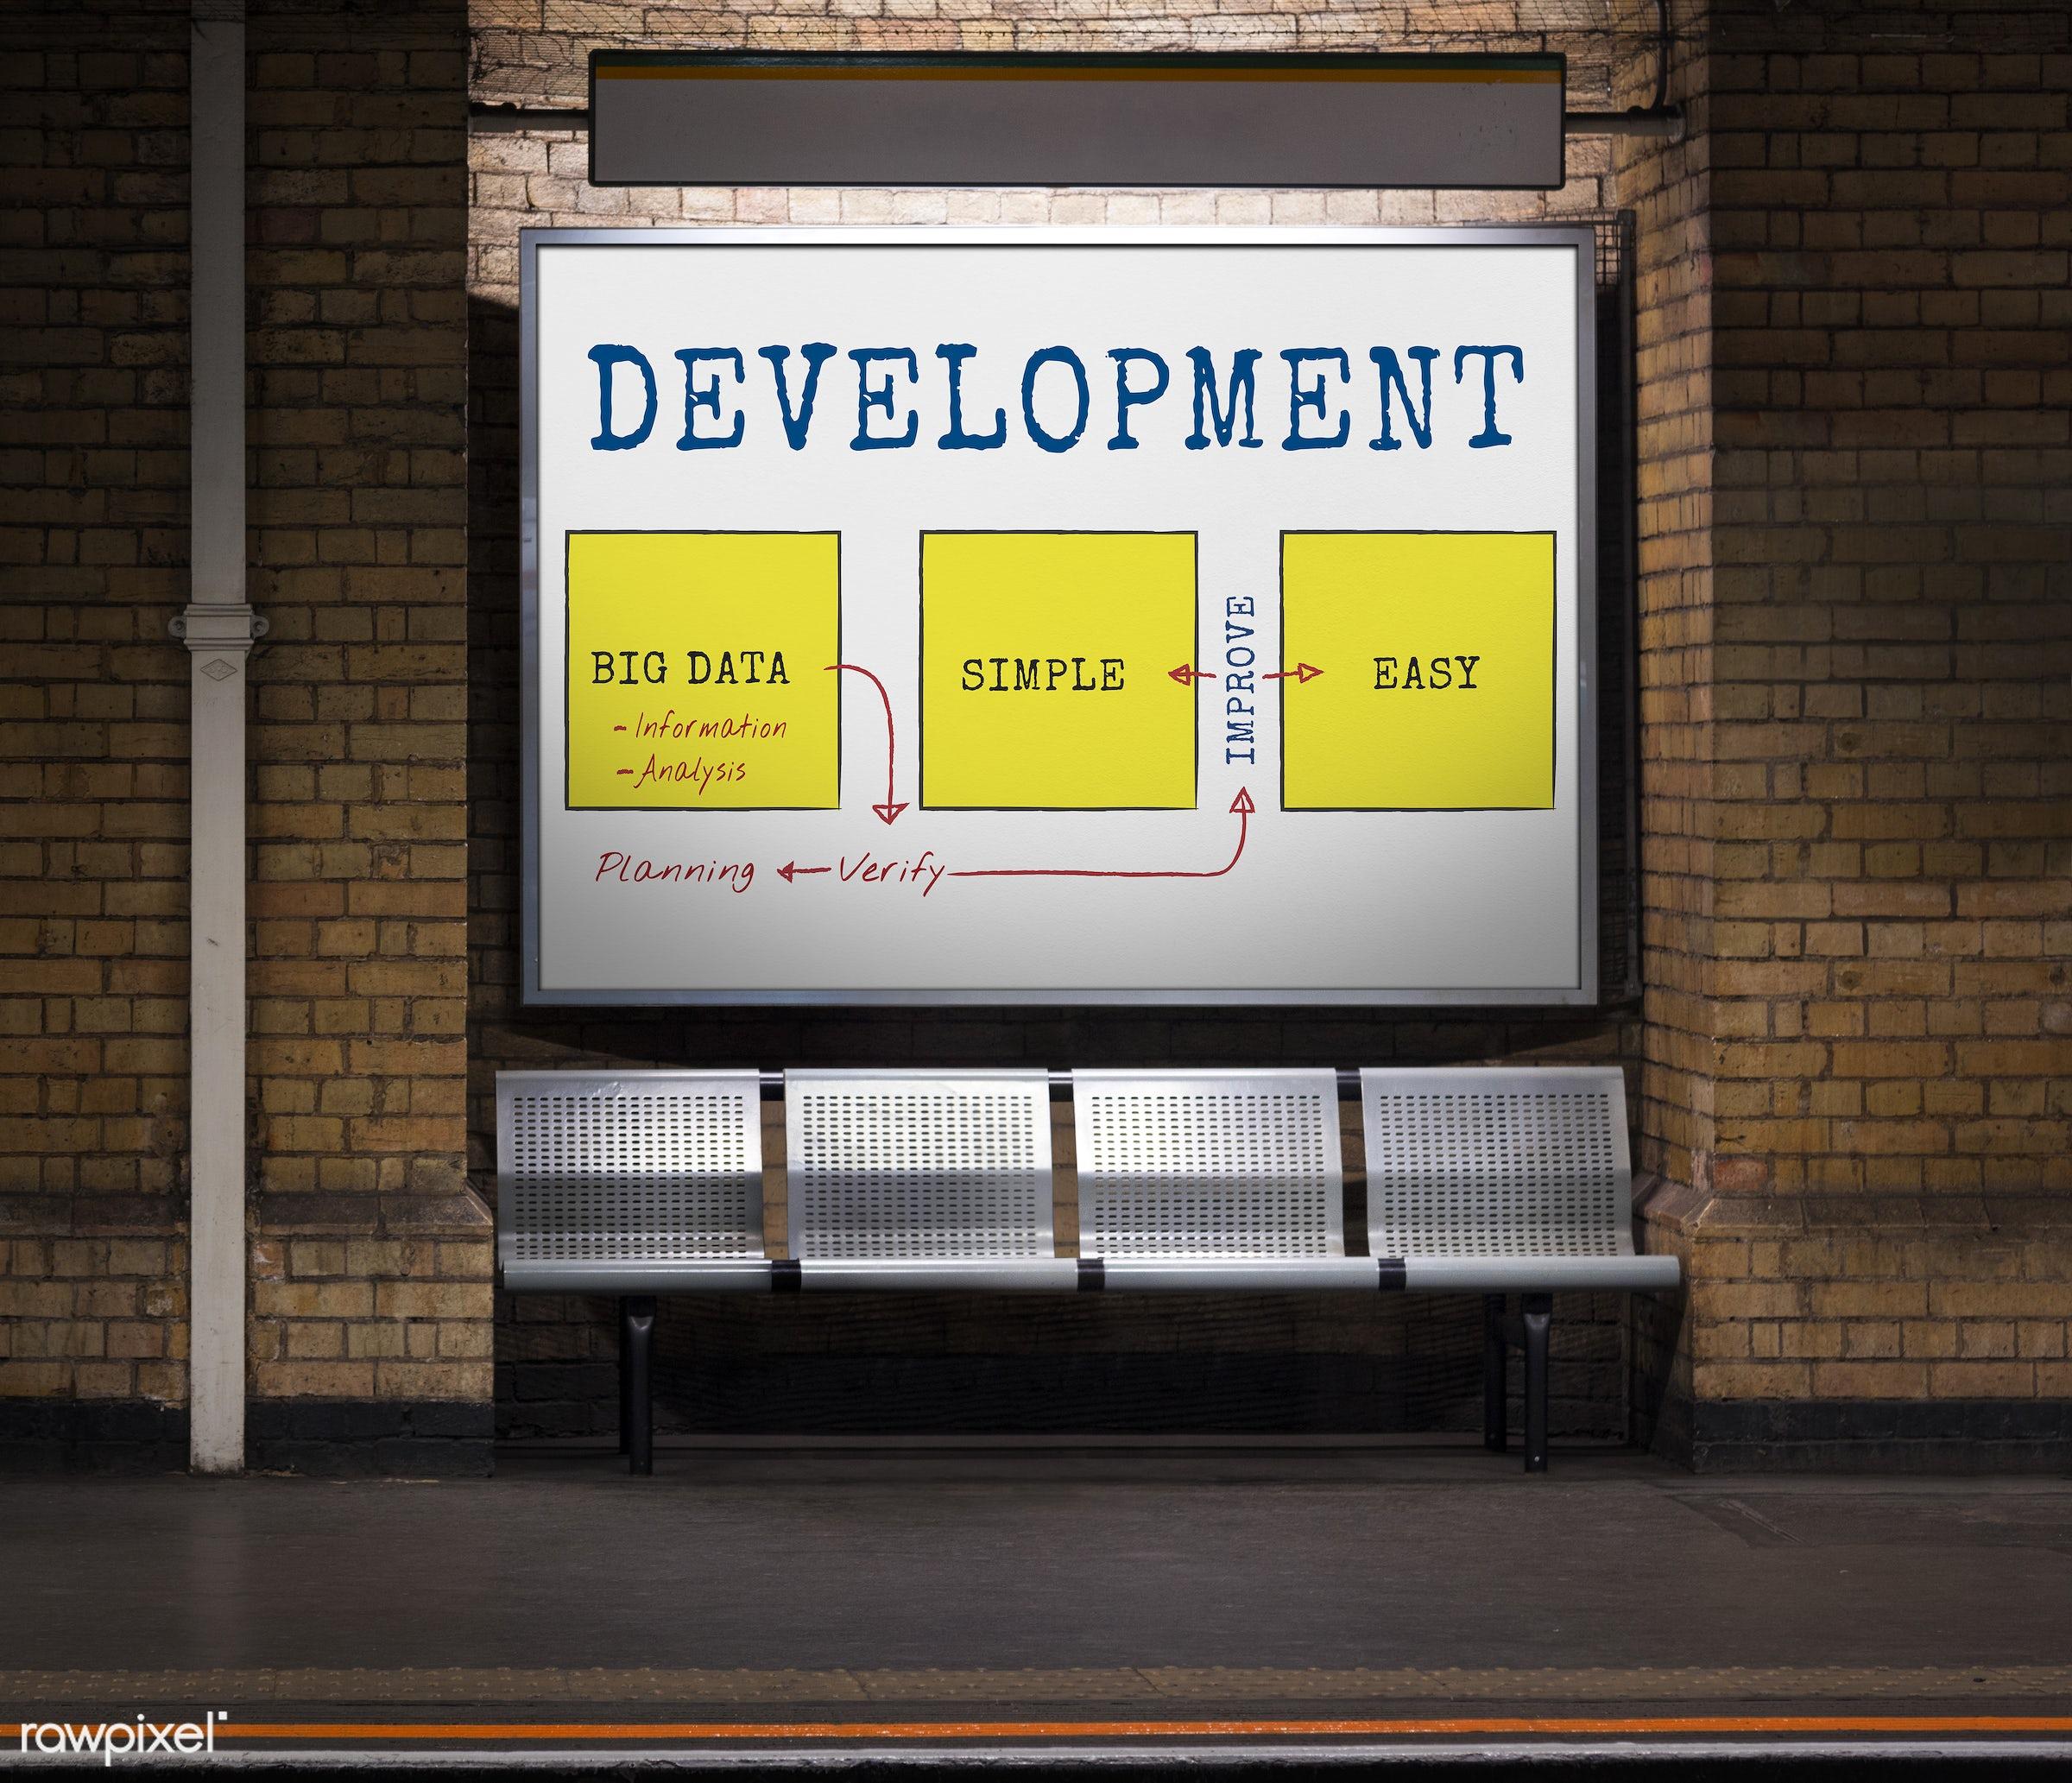 big data, bricks, brickswall, chart, cloud, data, development, diagram, easy, efficiency, icon, improve, information,...